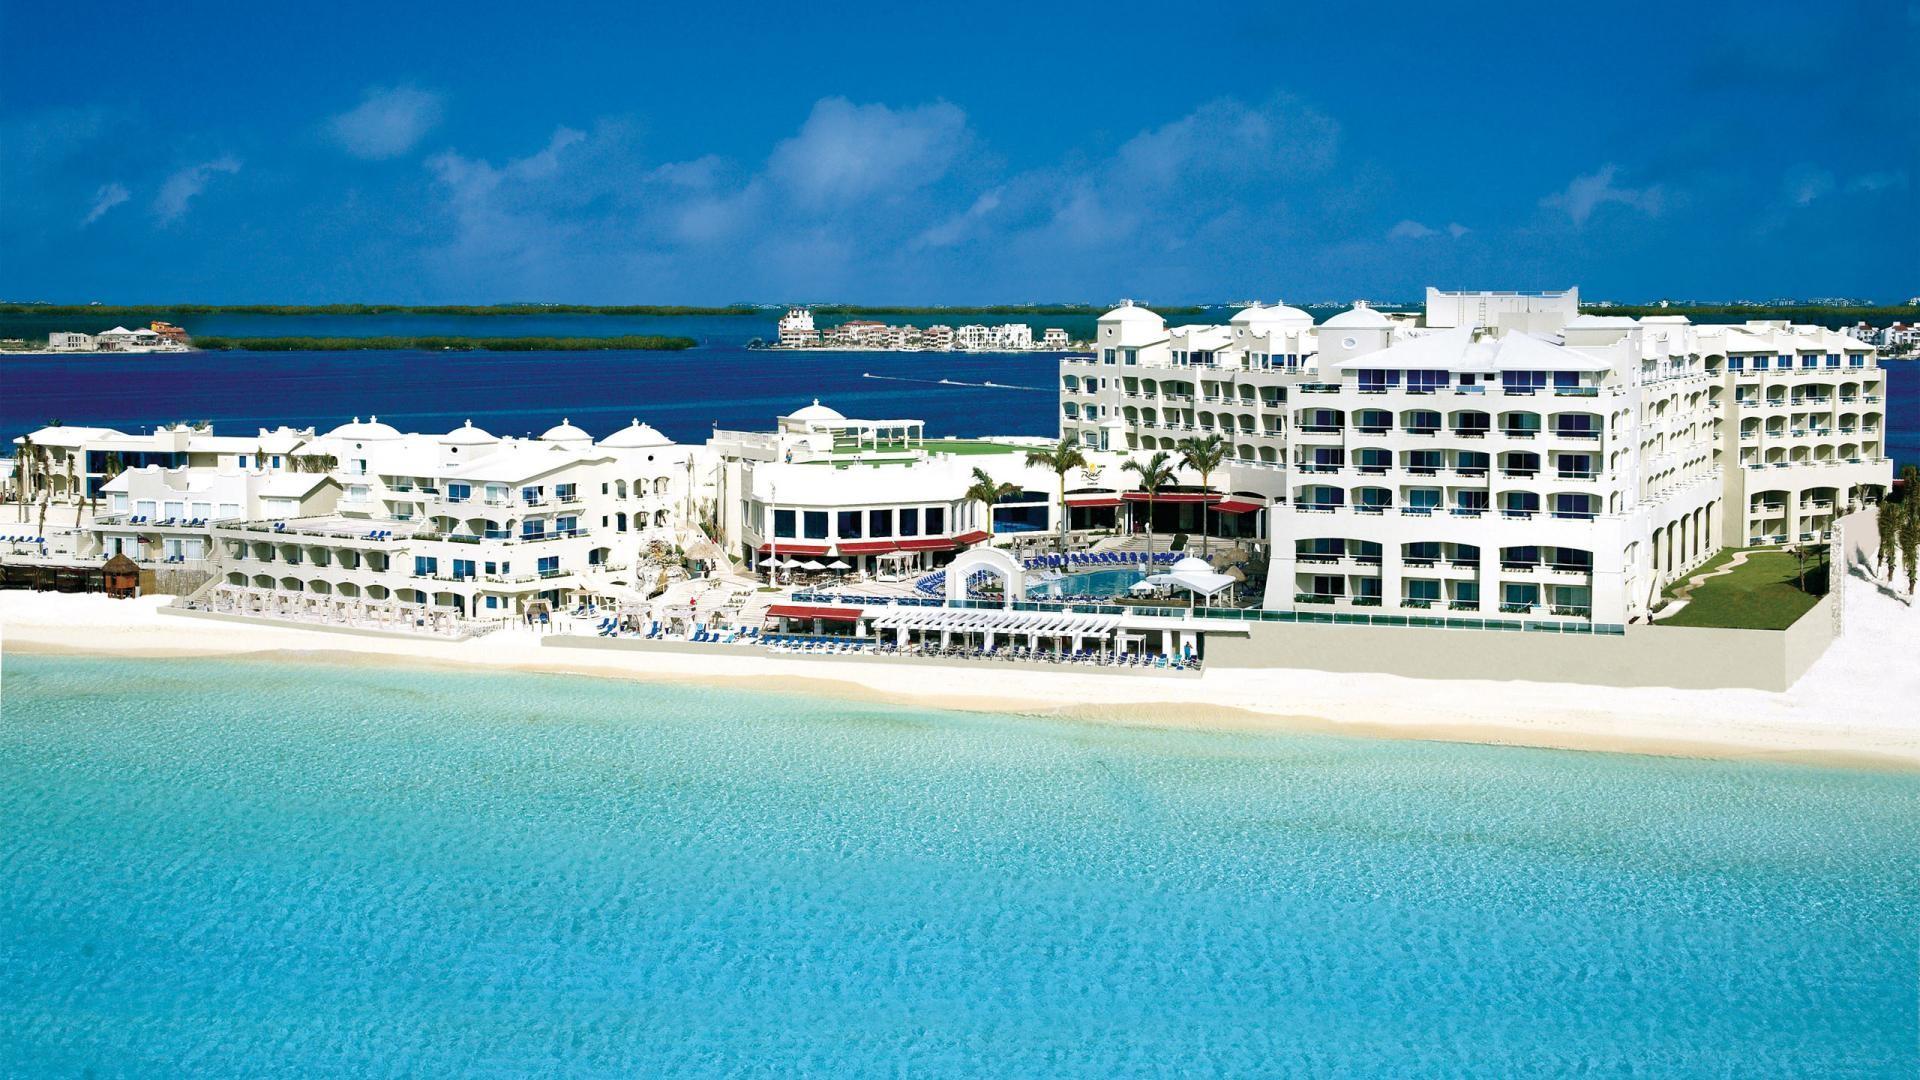 Mexico Cancun Beach Resort HD Wallpaper